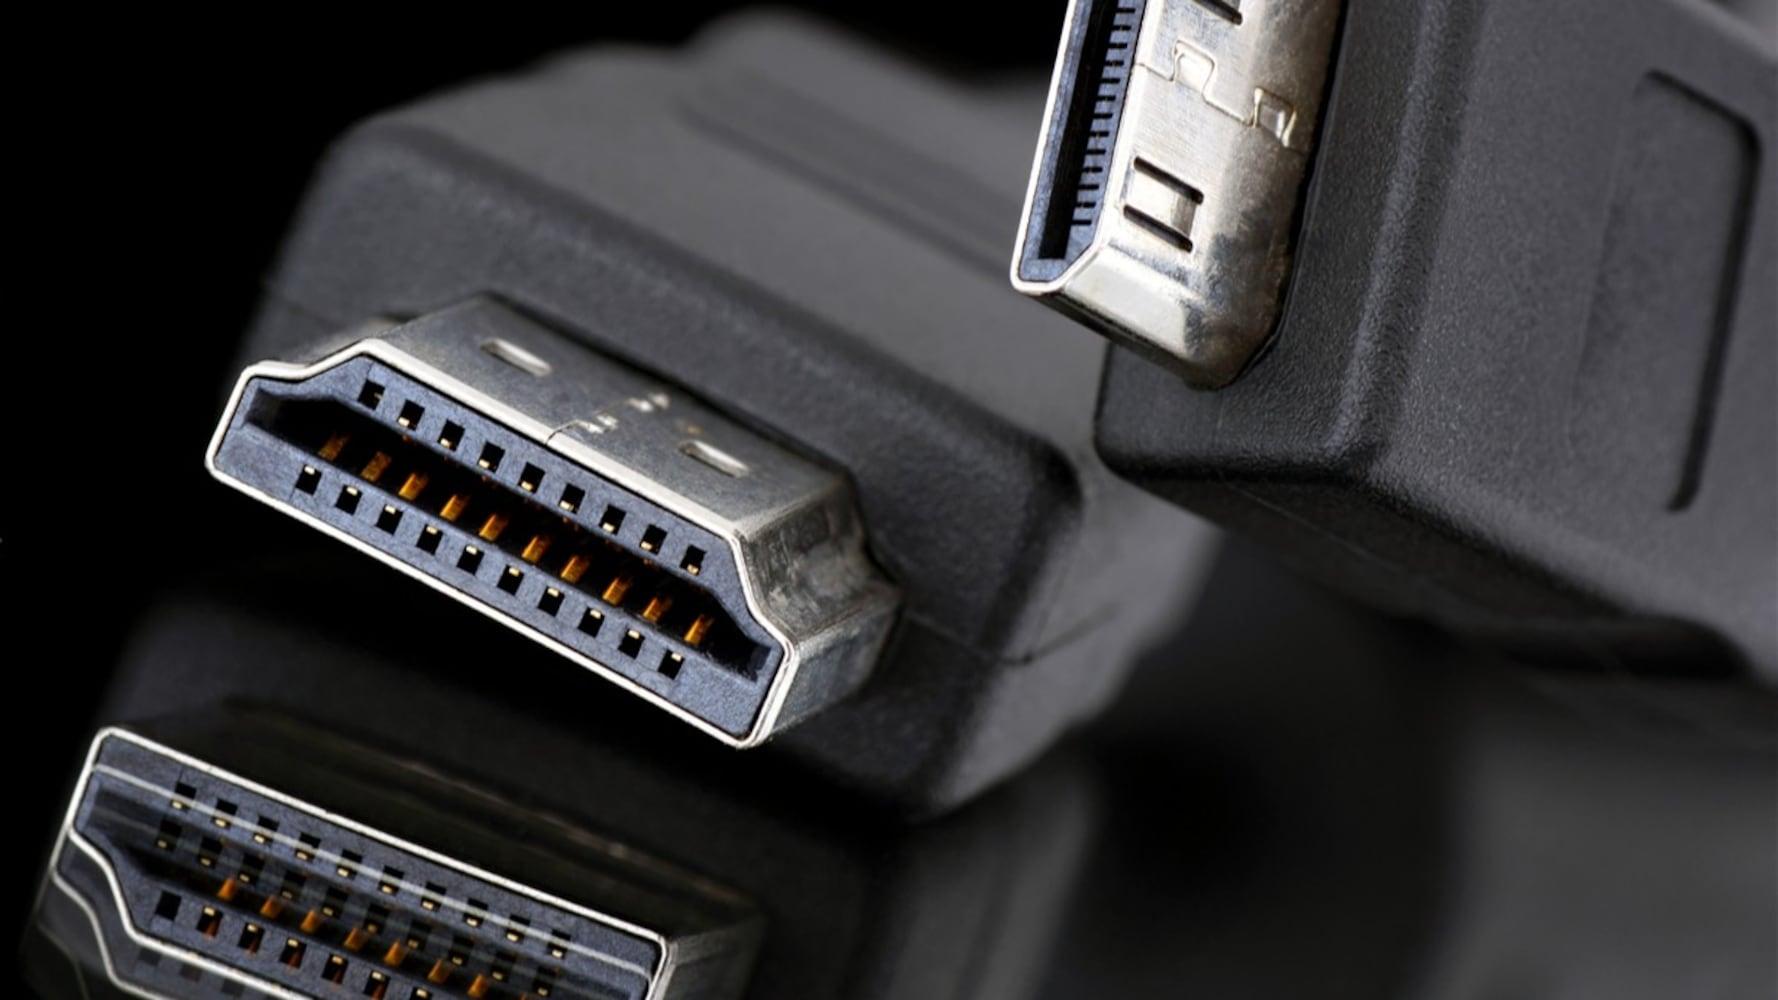 HDMI端子が有るかどうか